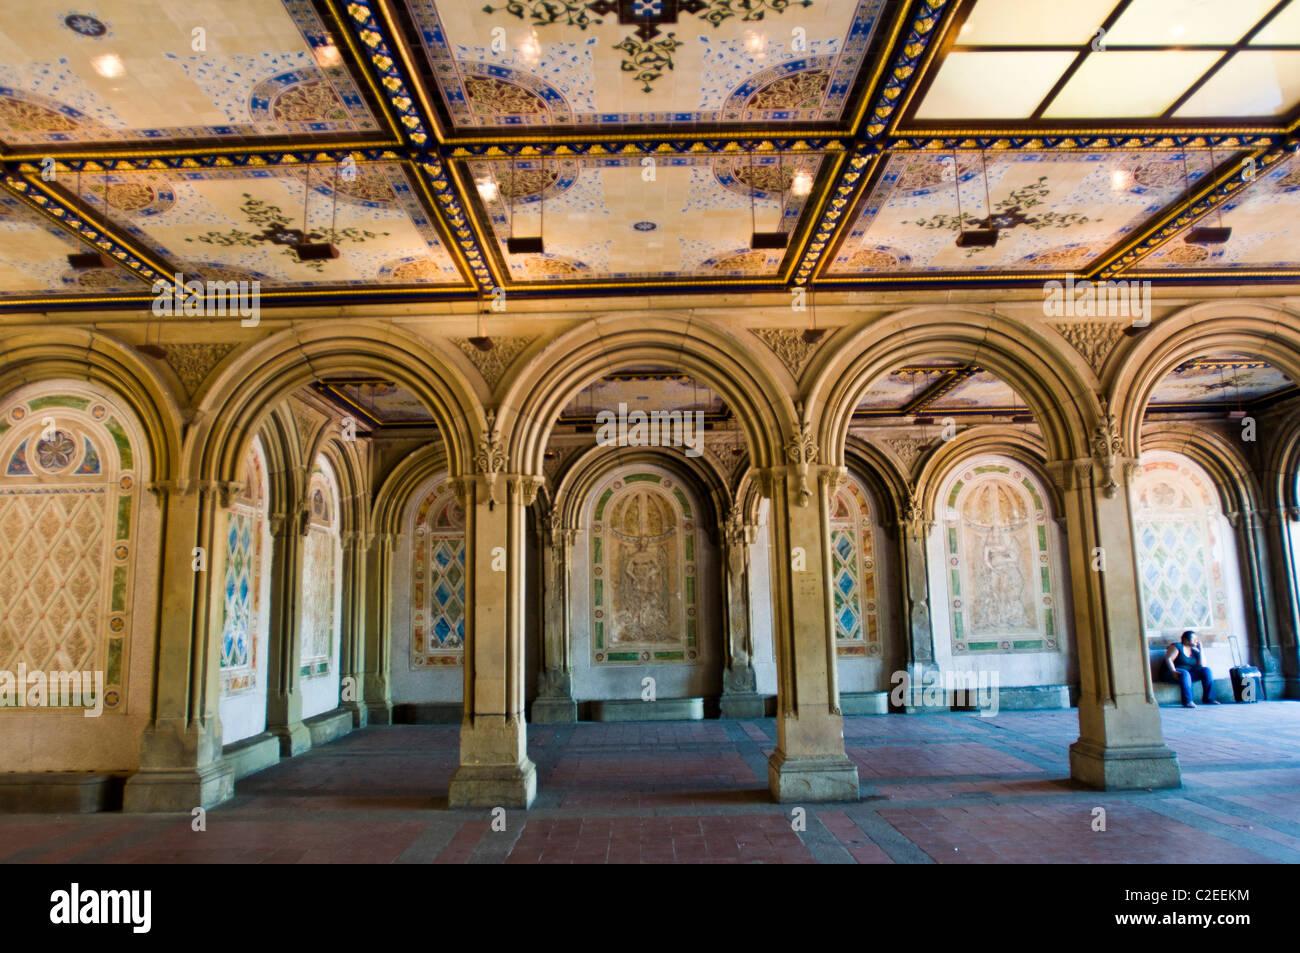 Restored Bethesda Terrace Arcade Central Park Manhattan